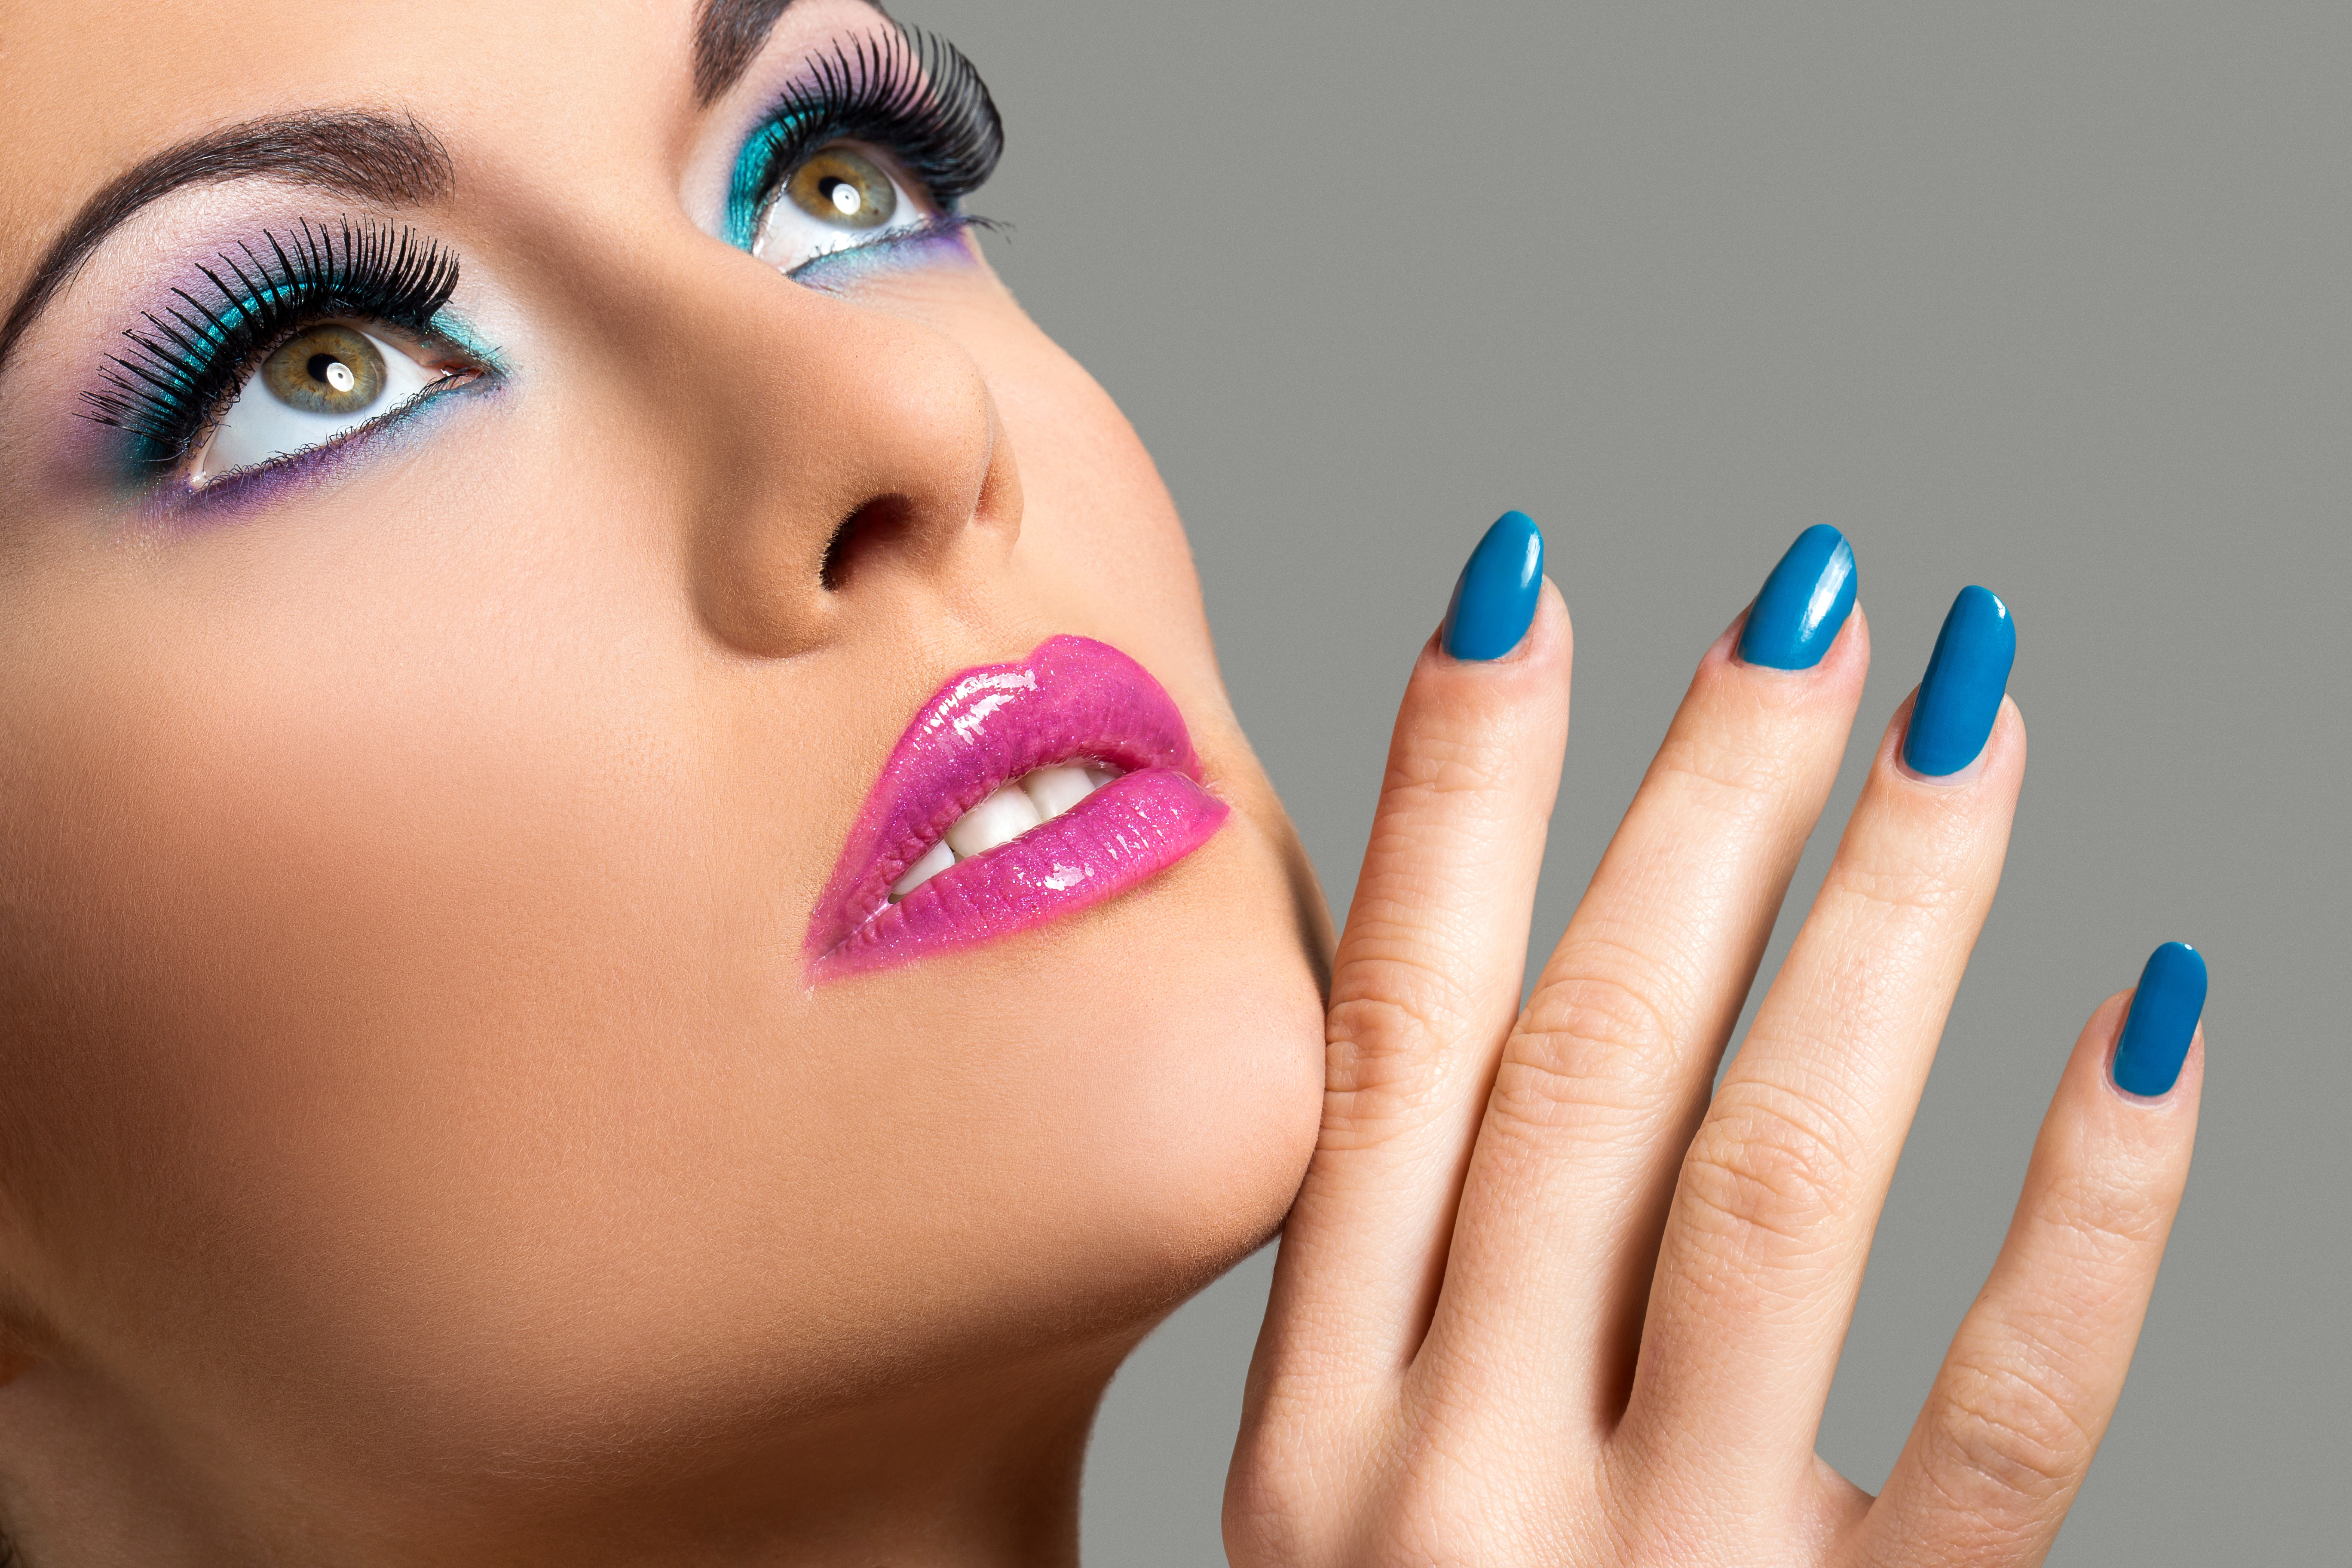 Image Manicure Makeup Beautiful Face Female Fingers 5472X3648-3735